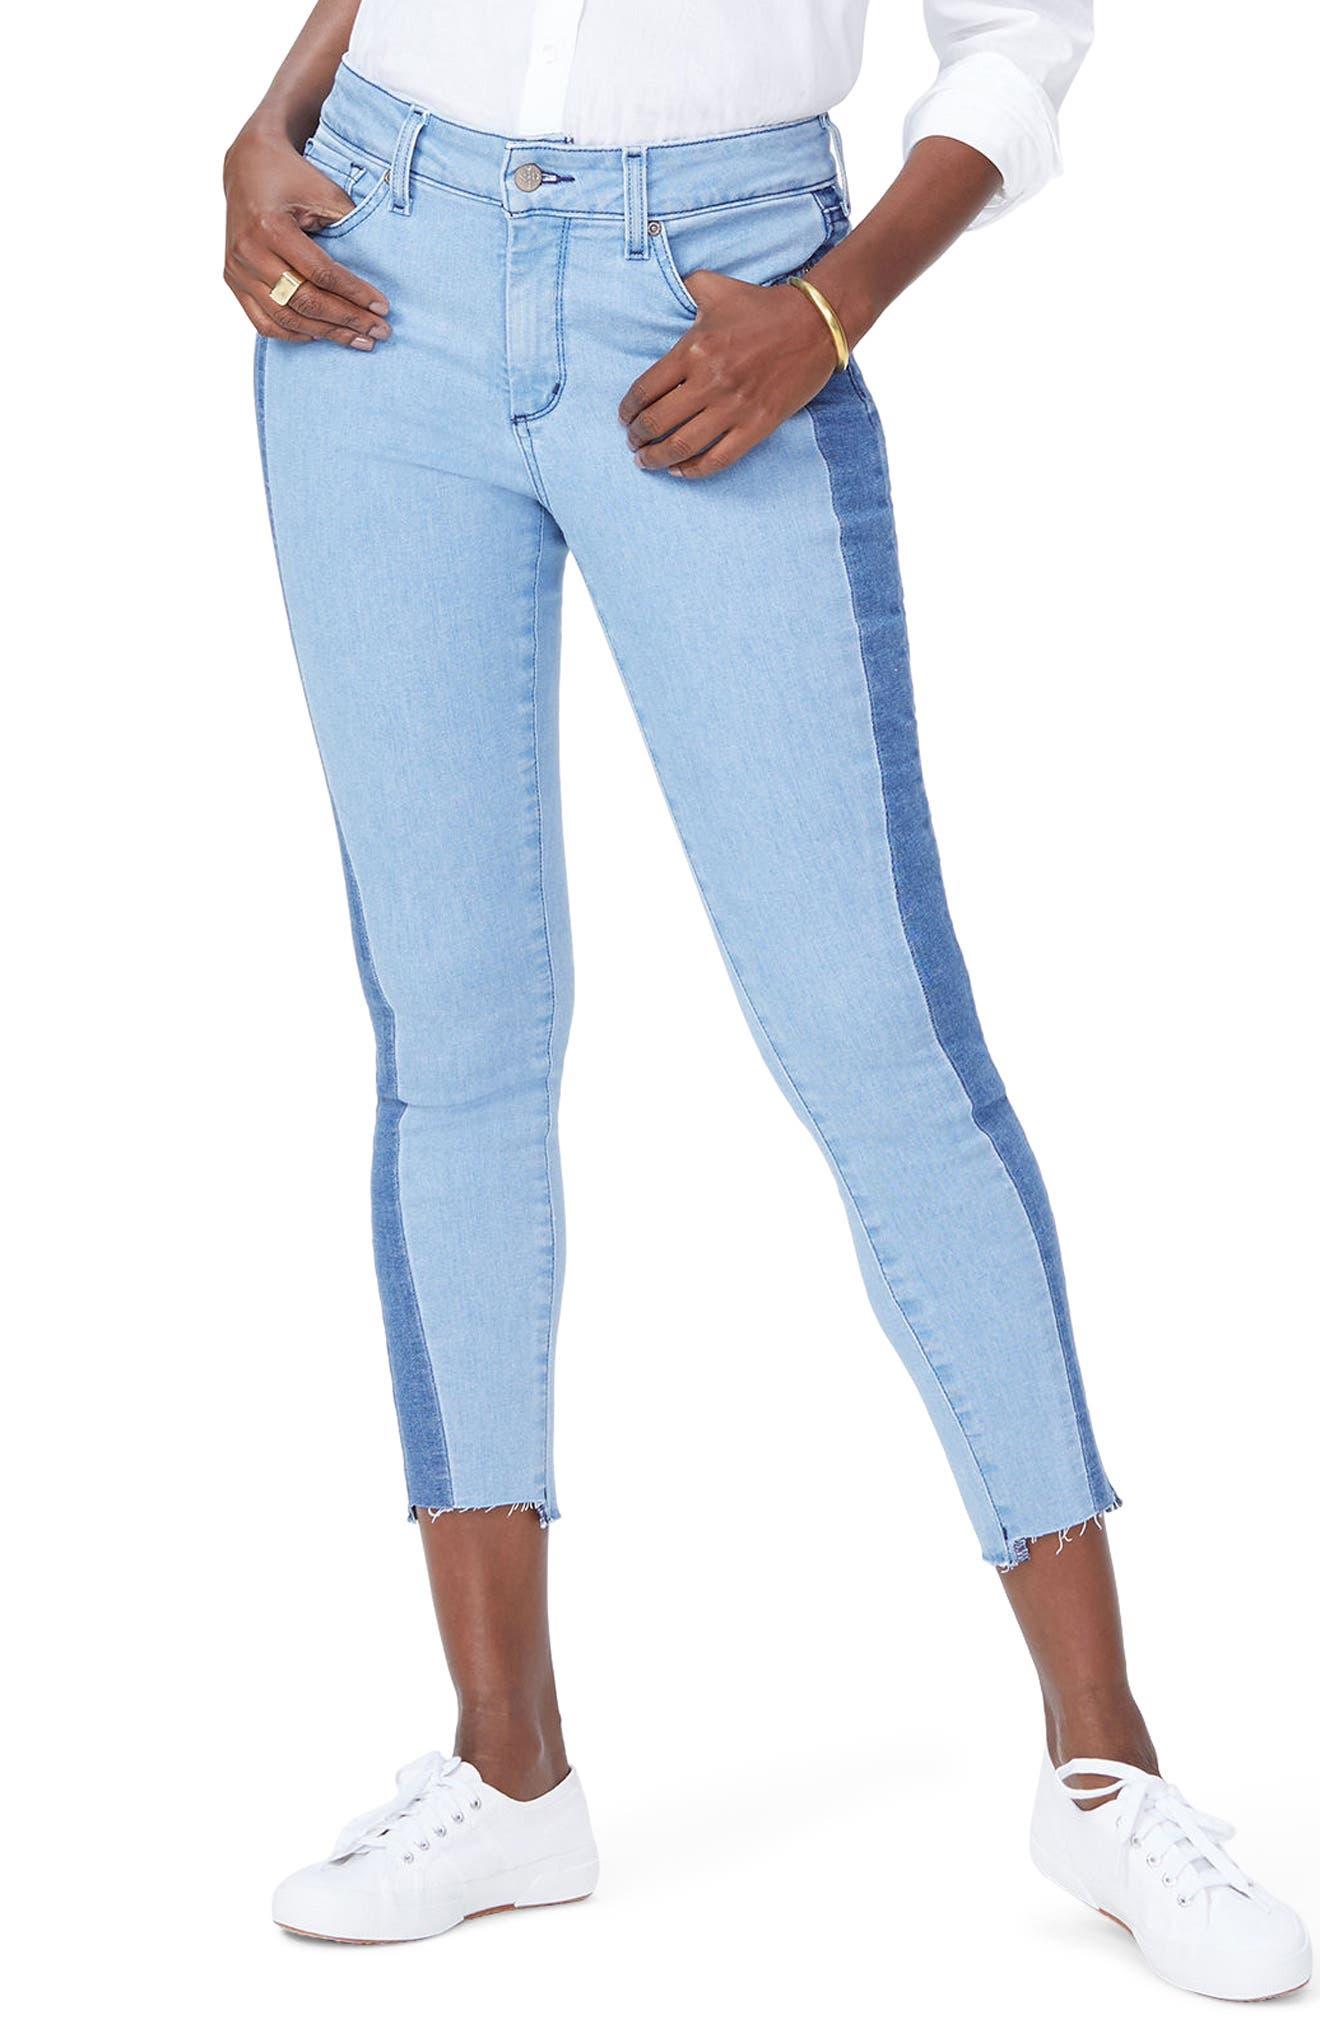 Ami Stretch Ankle Skinny Contrast Step Hem Jeans,                         Main,                         color, 462